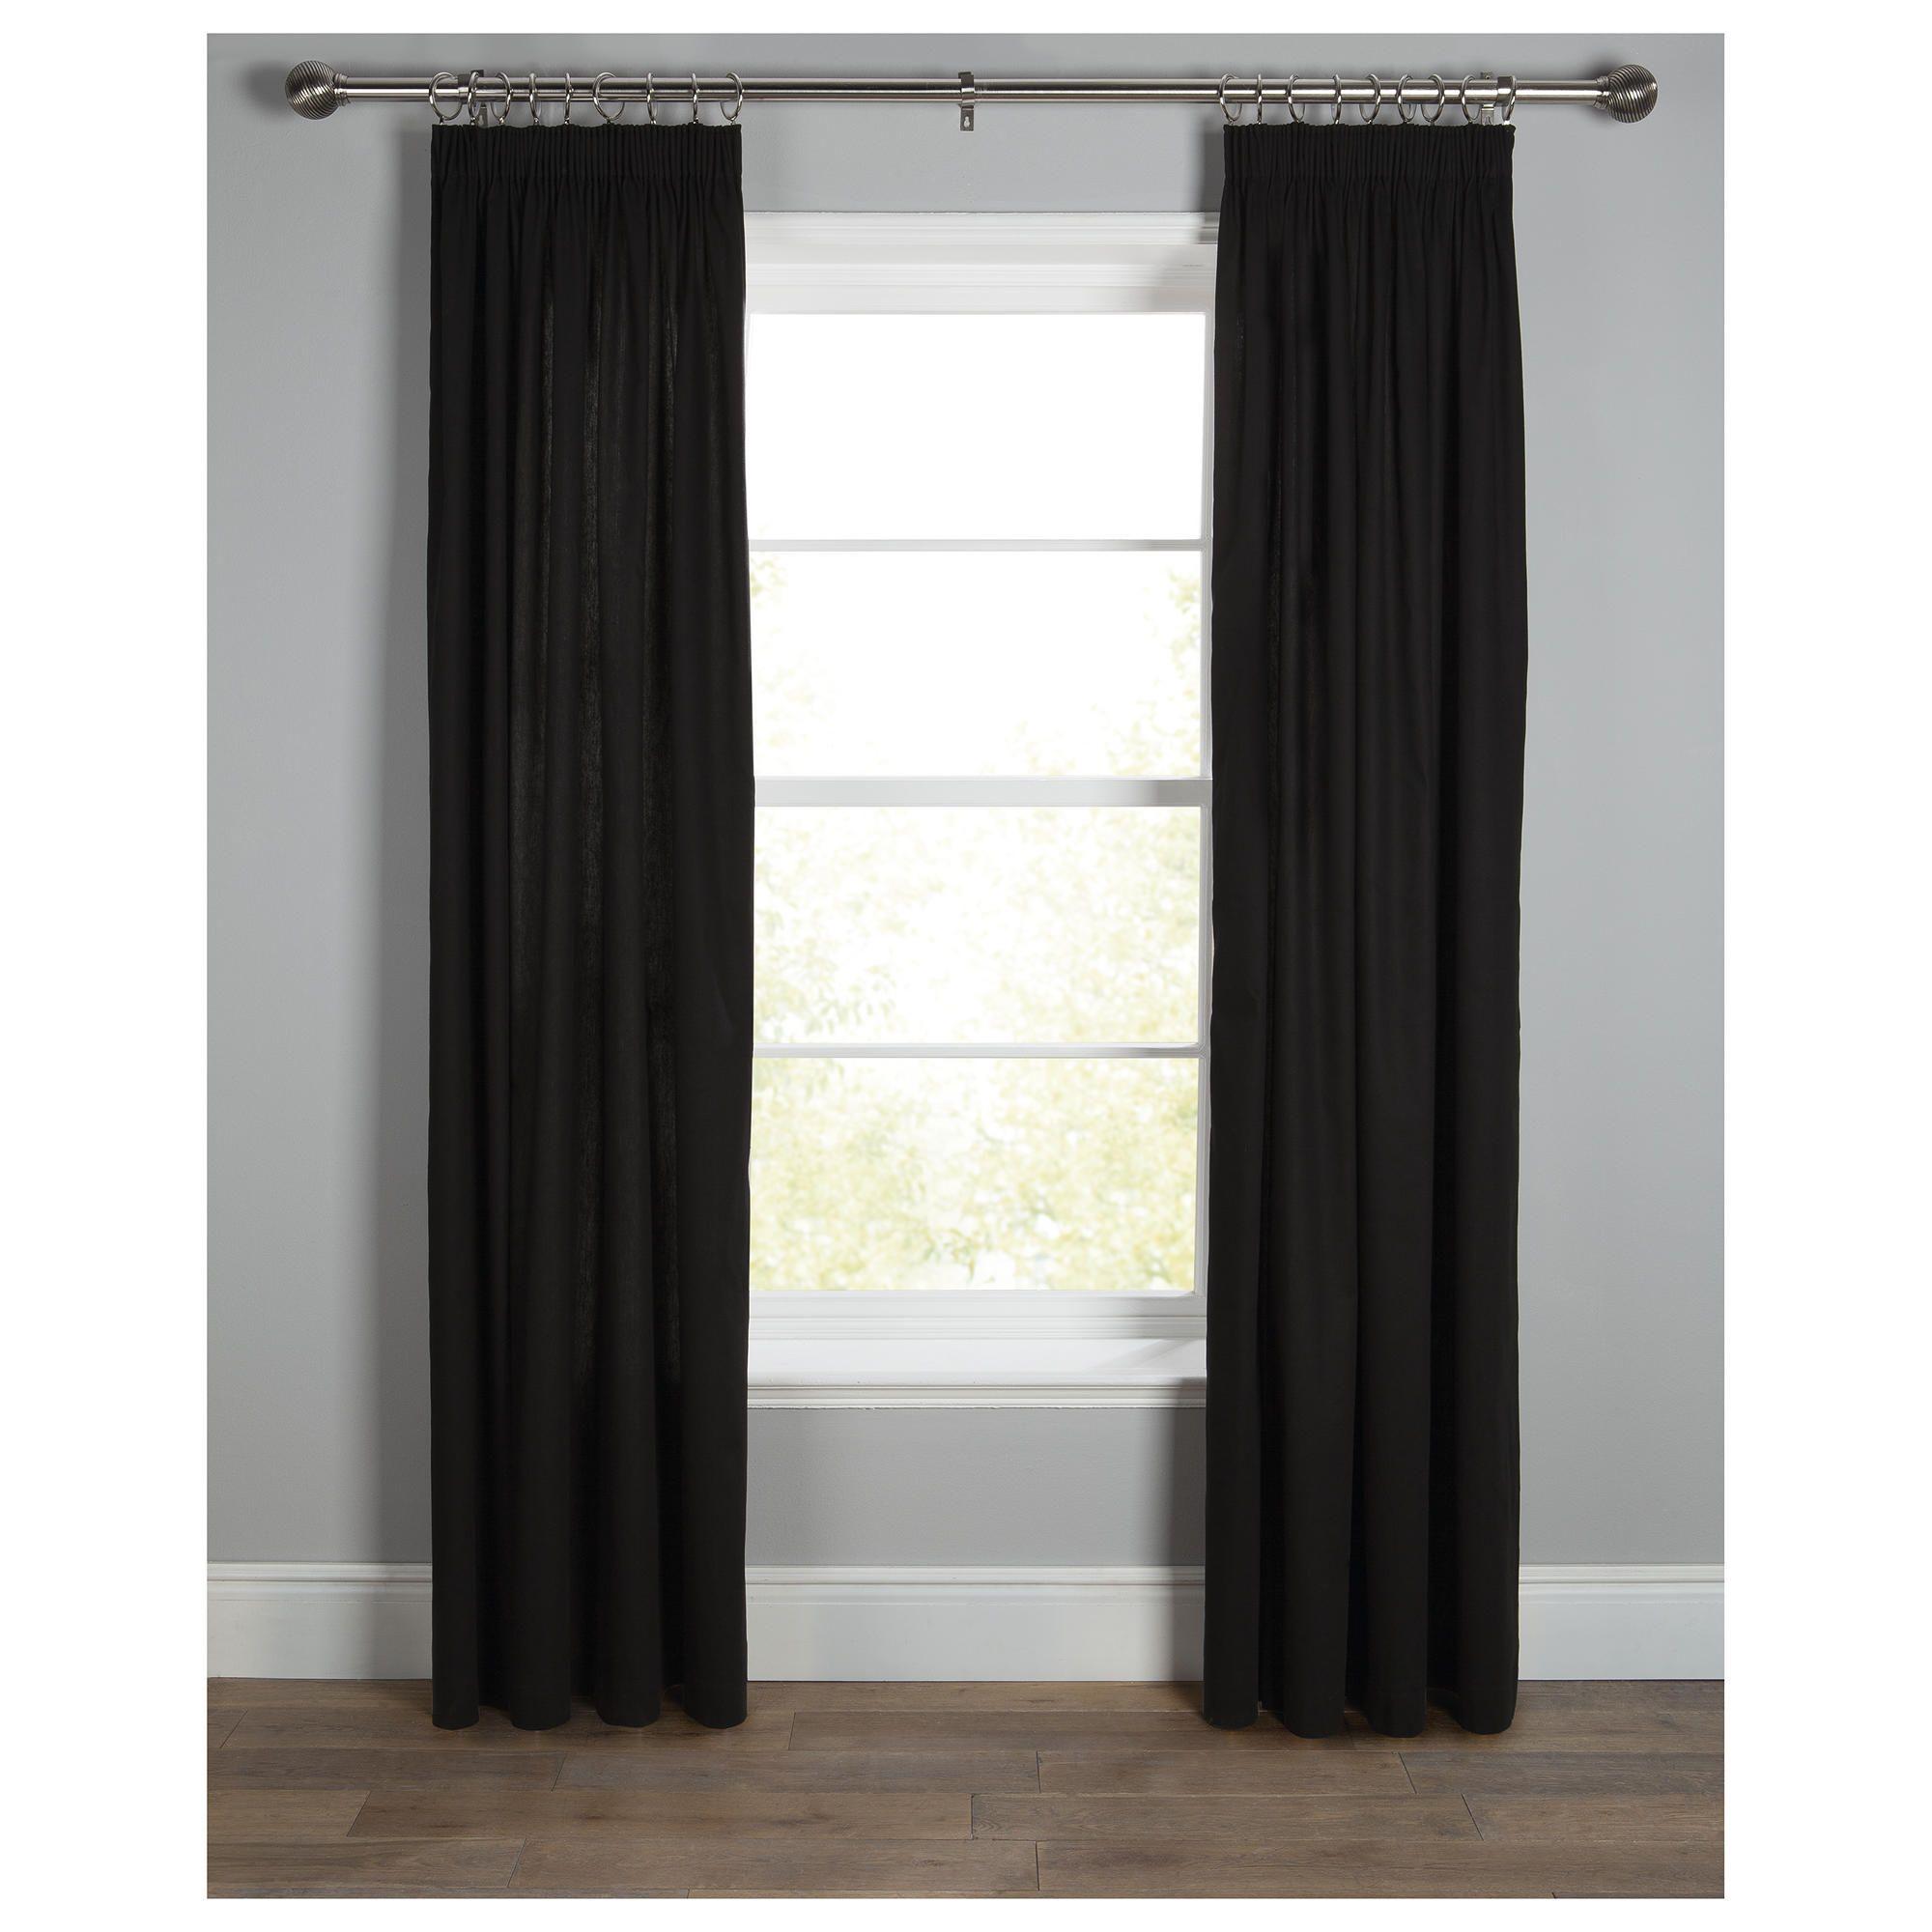 Cotton Canvas Black Eyelet Lined Curtain: 100% Thick Cotton Canvas Pencil Pleat Curtains 44 X 90